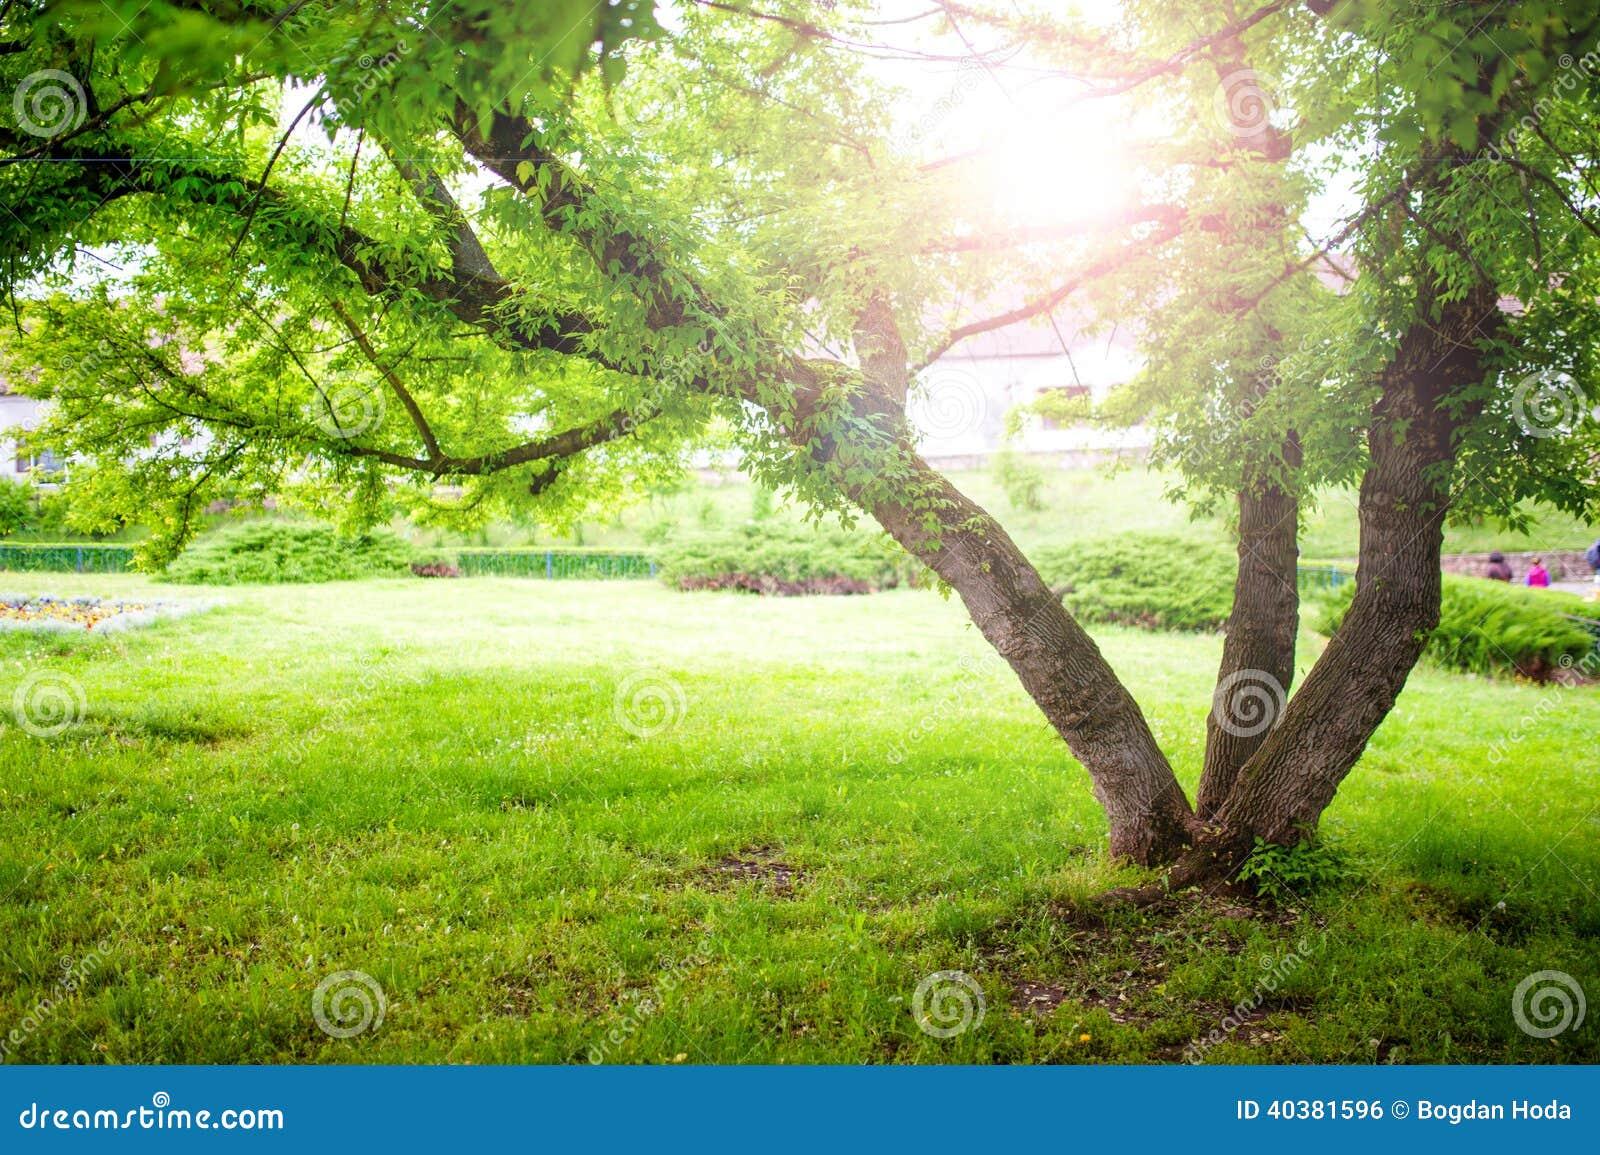 Beautiful Green Nature Park Scenery Wallpaper